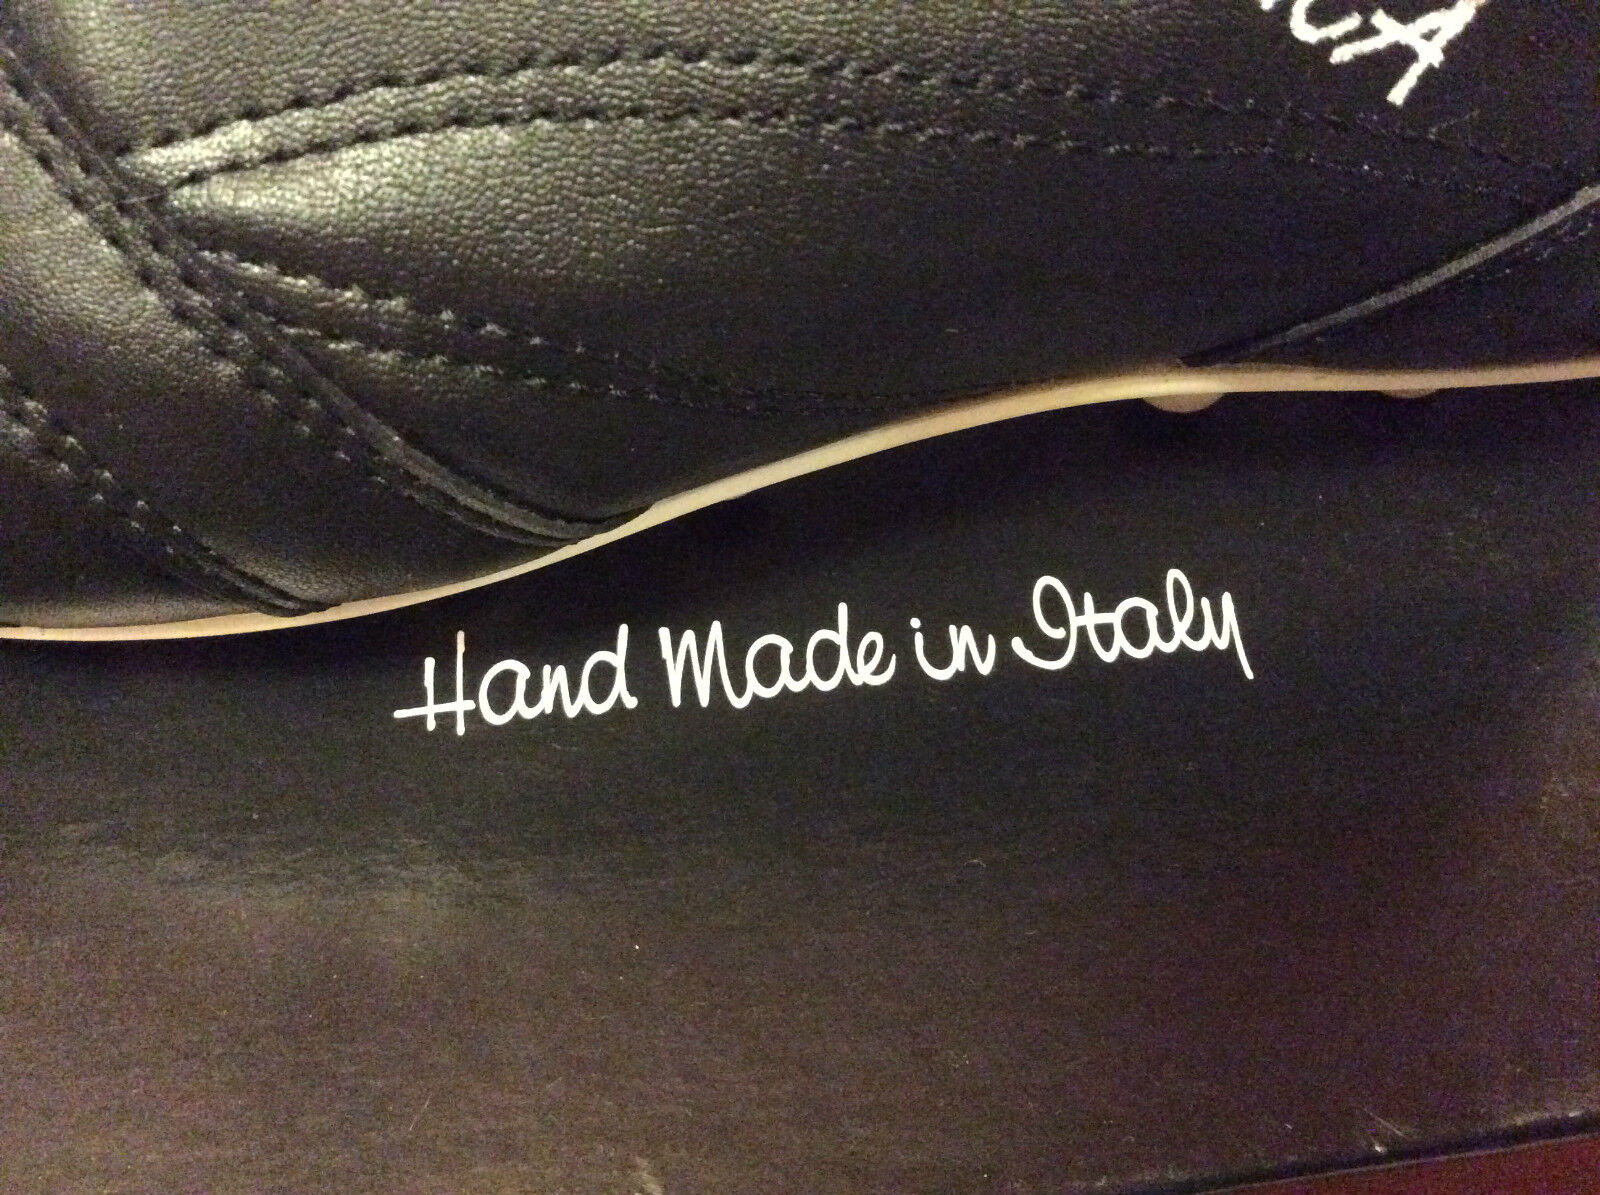 Herren Schuhe Fußball RYAL Italica volle - 13 Stollen Leder volle Italica Fiore 39ab2f